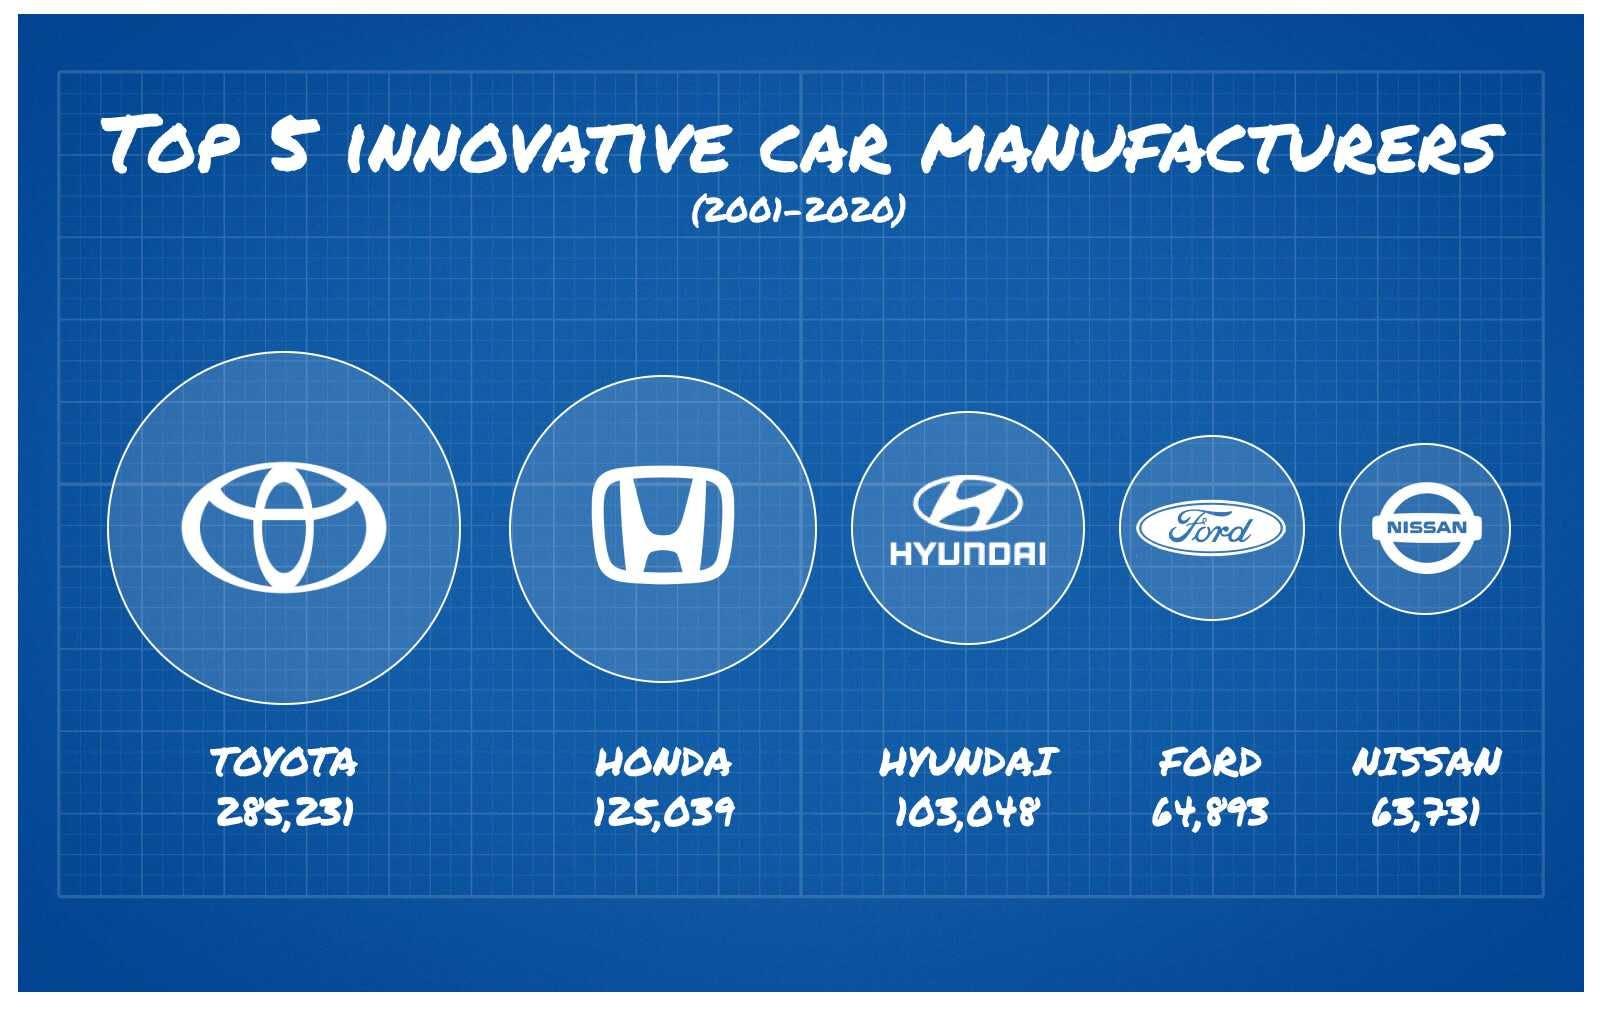 Top 5 innovative car manufacturers Lease Fetcher